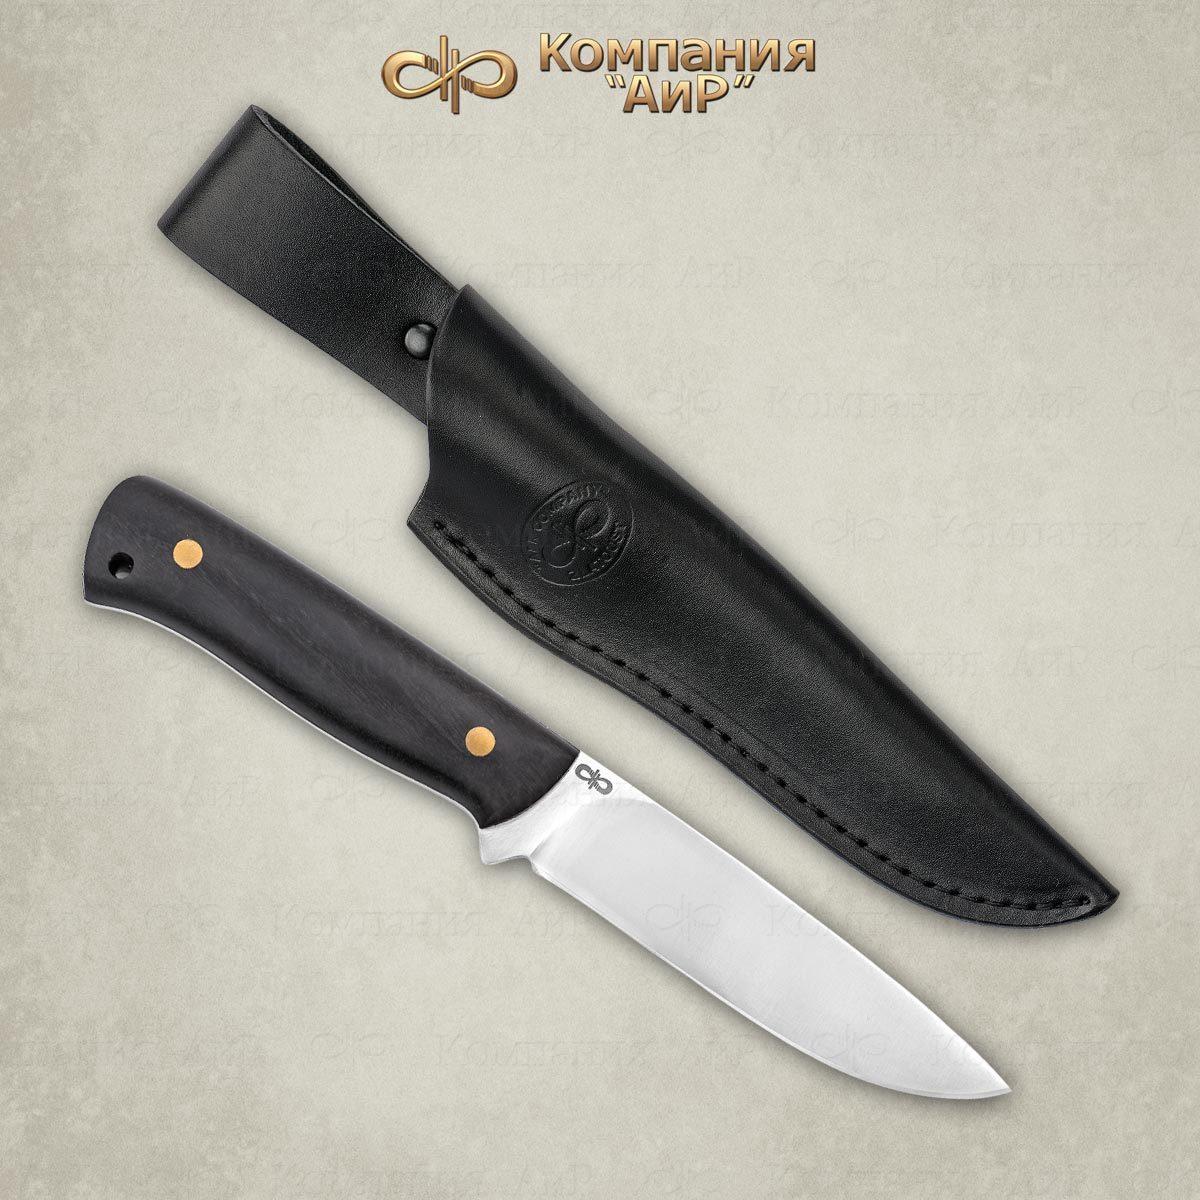 Фото - Нож разделочный АиР Стриж ЦМ, сталь 110х18 М-ШД, рукоять граб нож казацкий засапожный сталь 110х18 рукоять граб